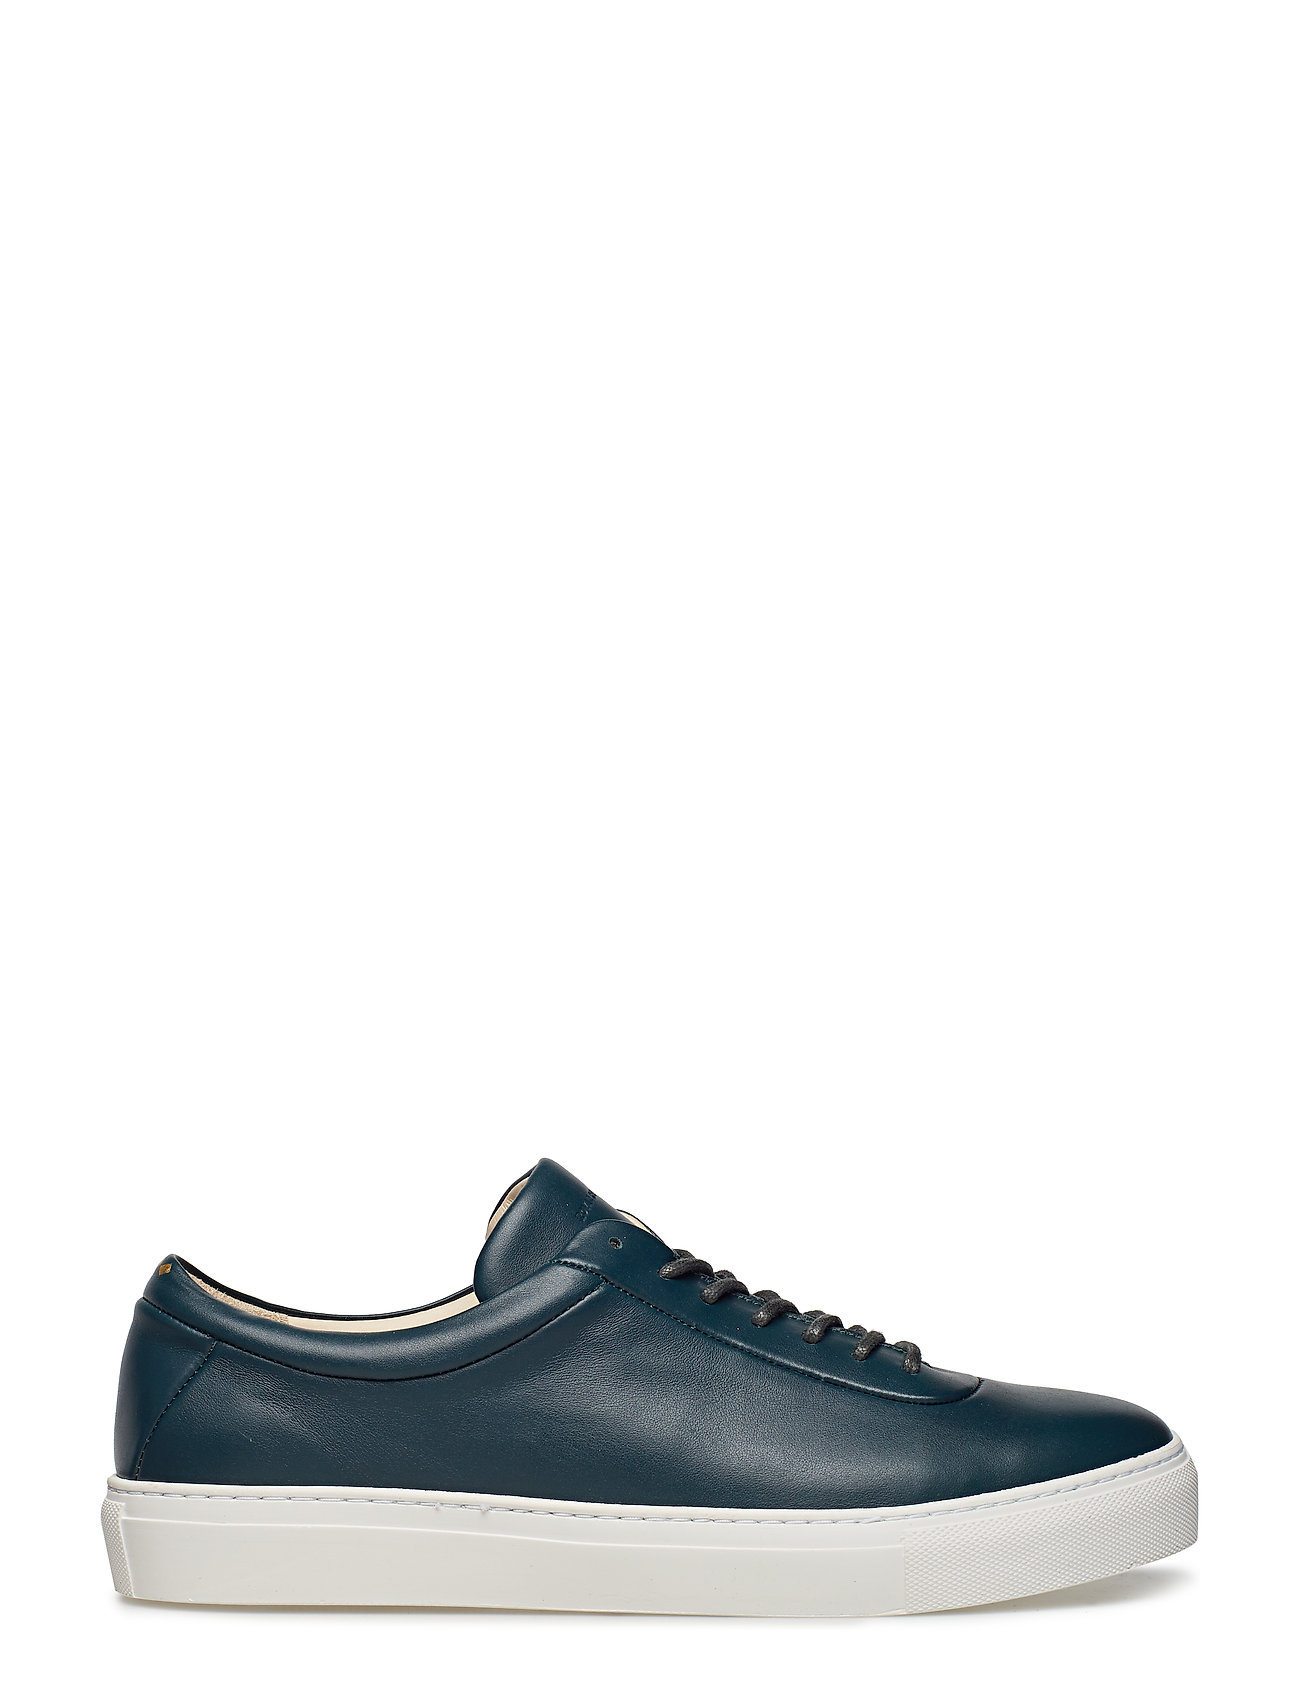 Brun Sneakers Sportsko Herre Royal Republiq Spartacus Hi